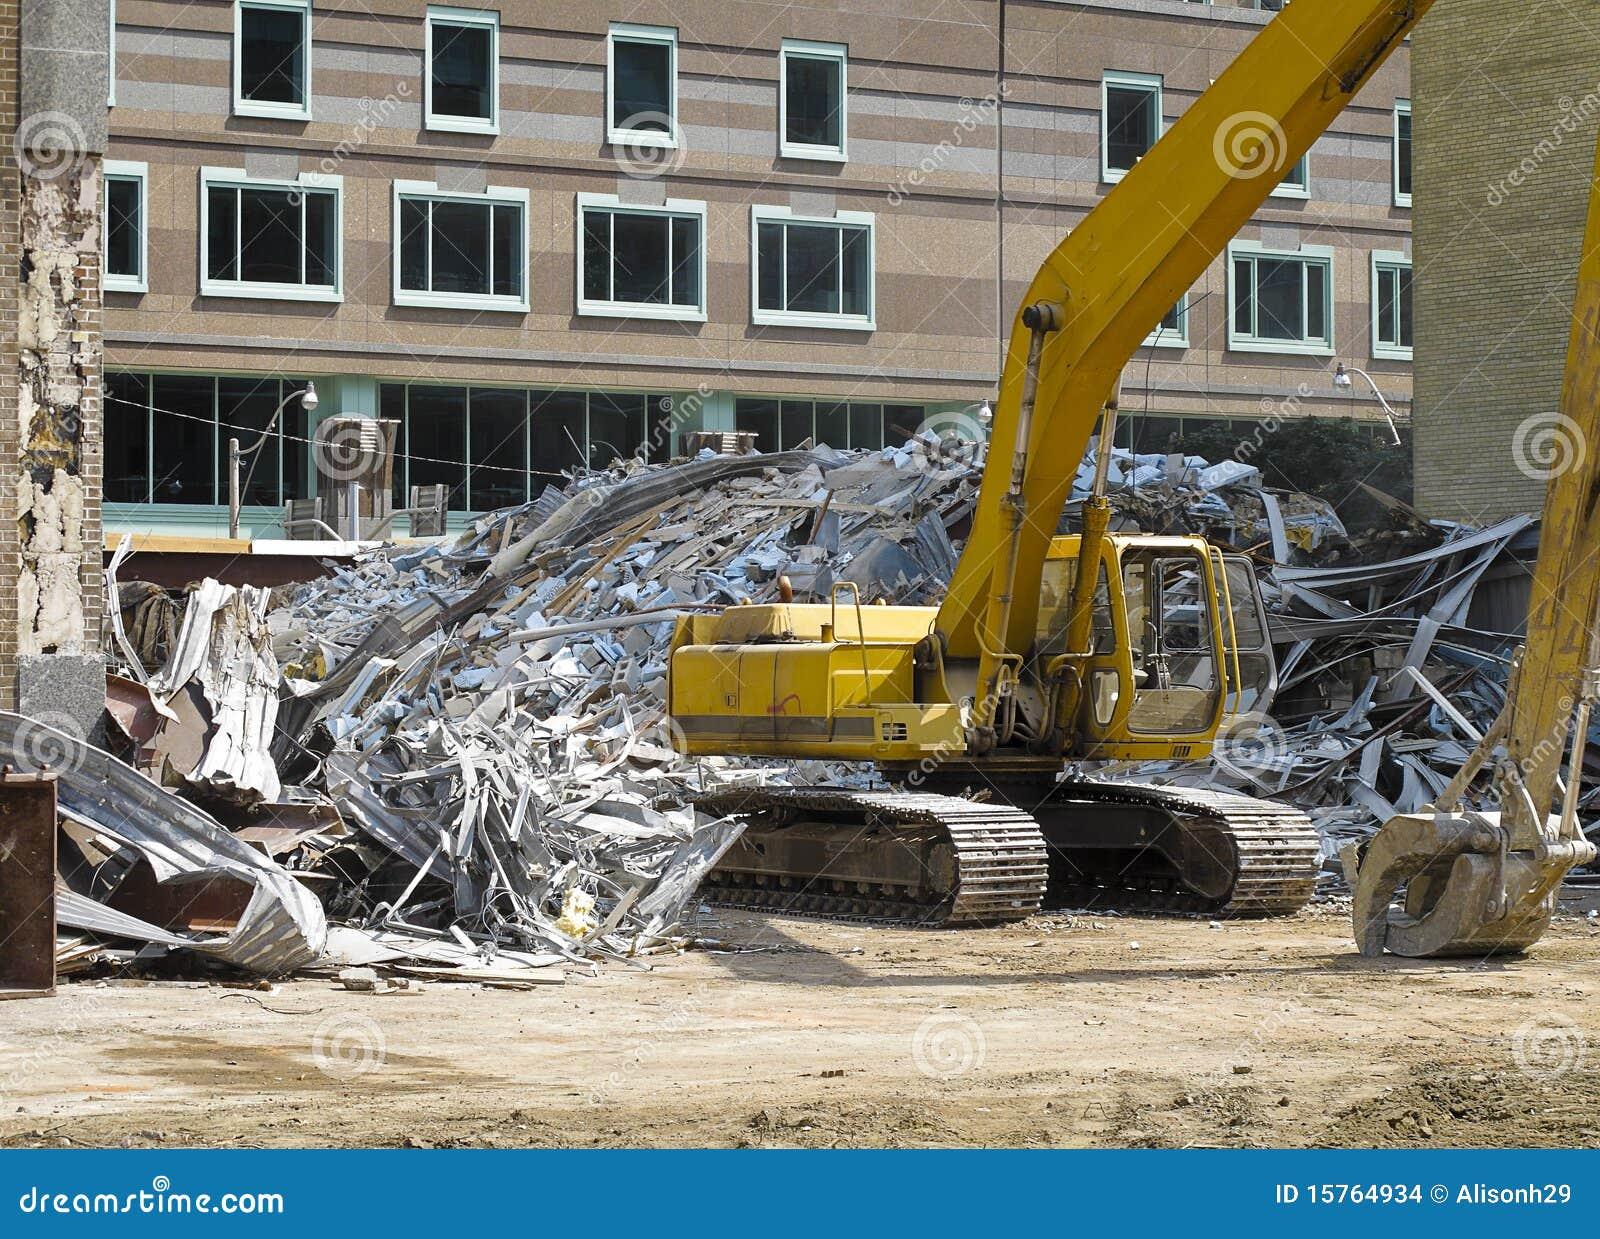 Building Demolition Cartoon : Demolition site in melbourne royalty free stock